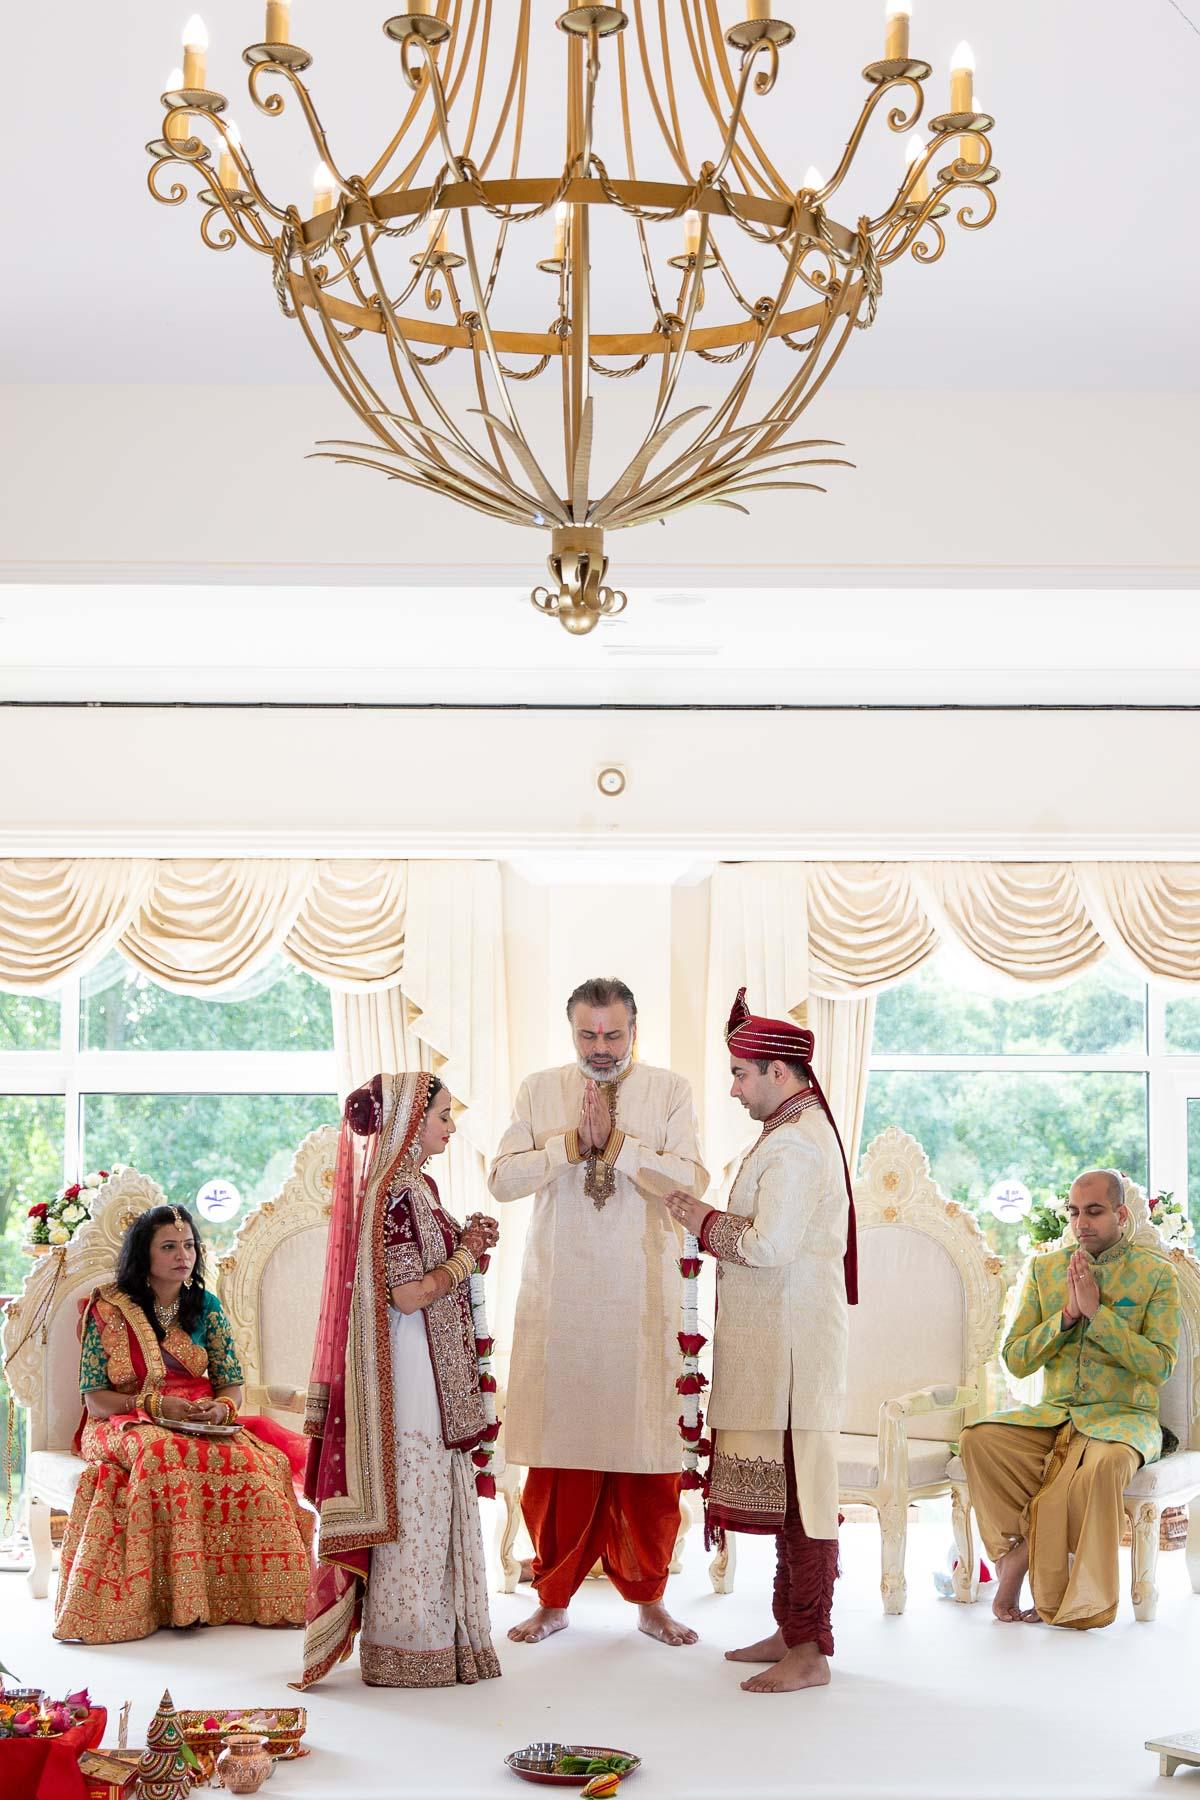 Hindu-wedding-photography-london-stoke-nayland-golf-spa-hotel-0015.jpg